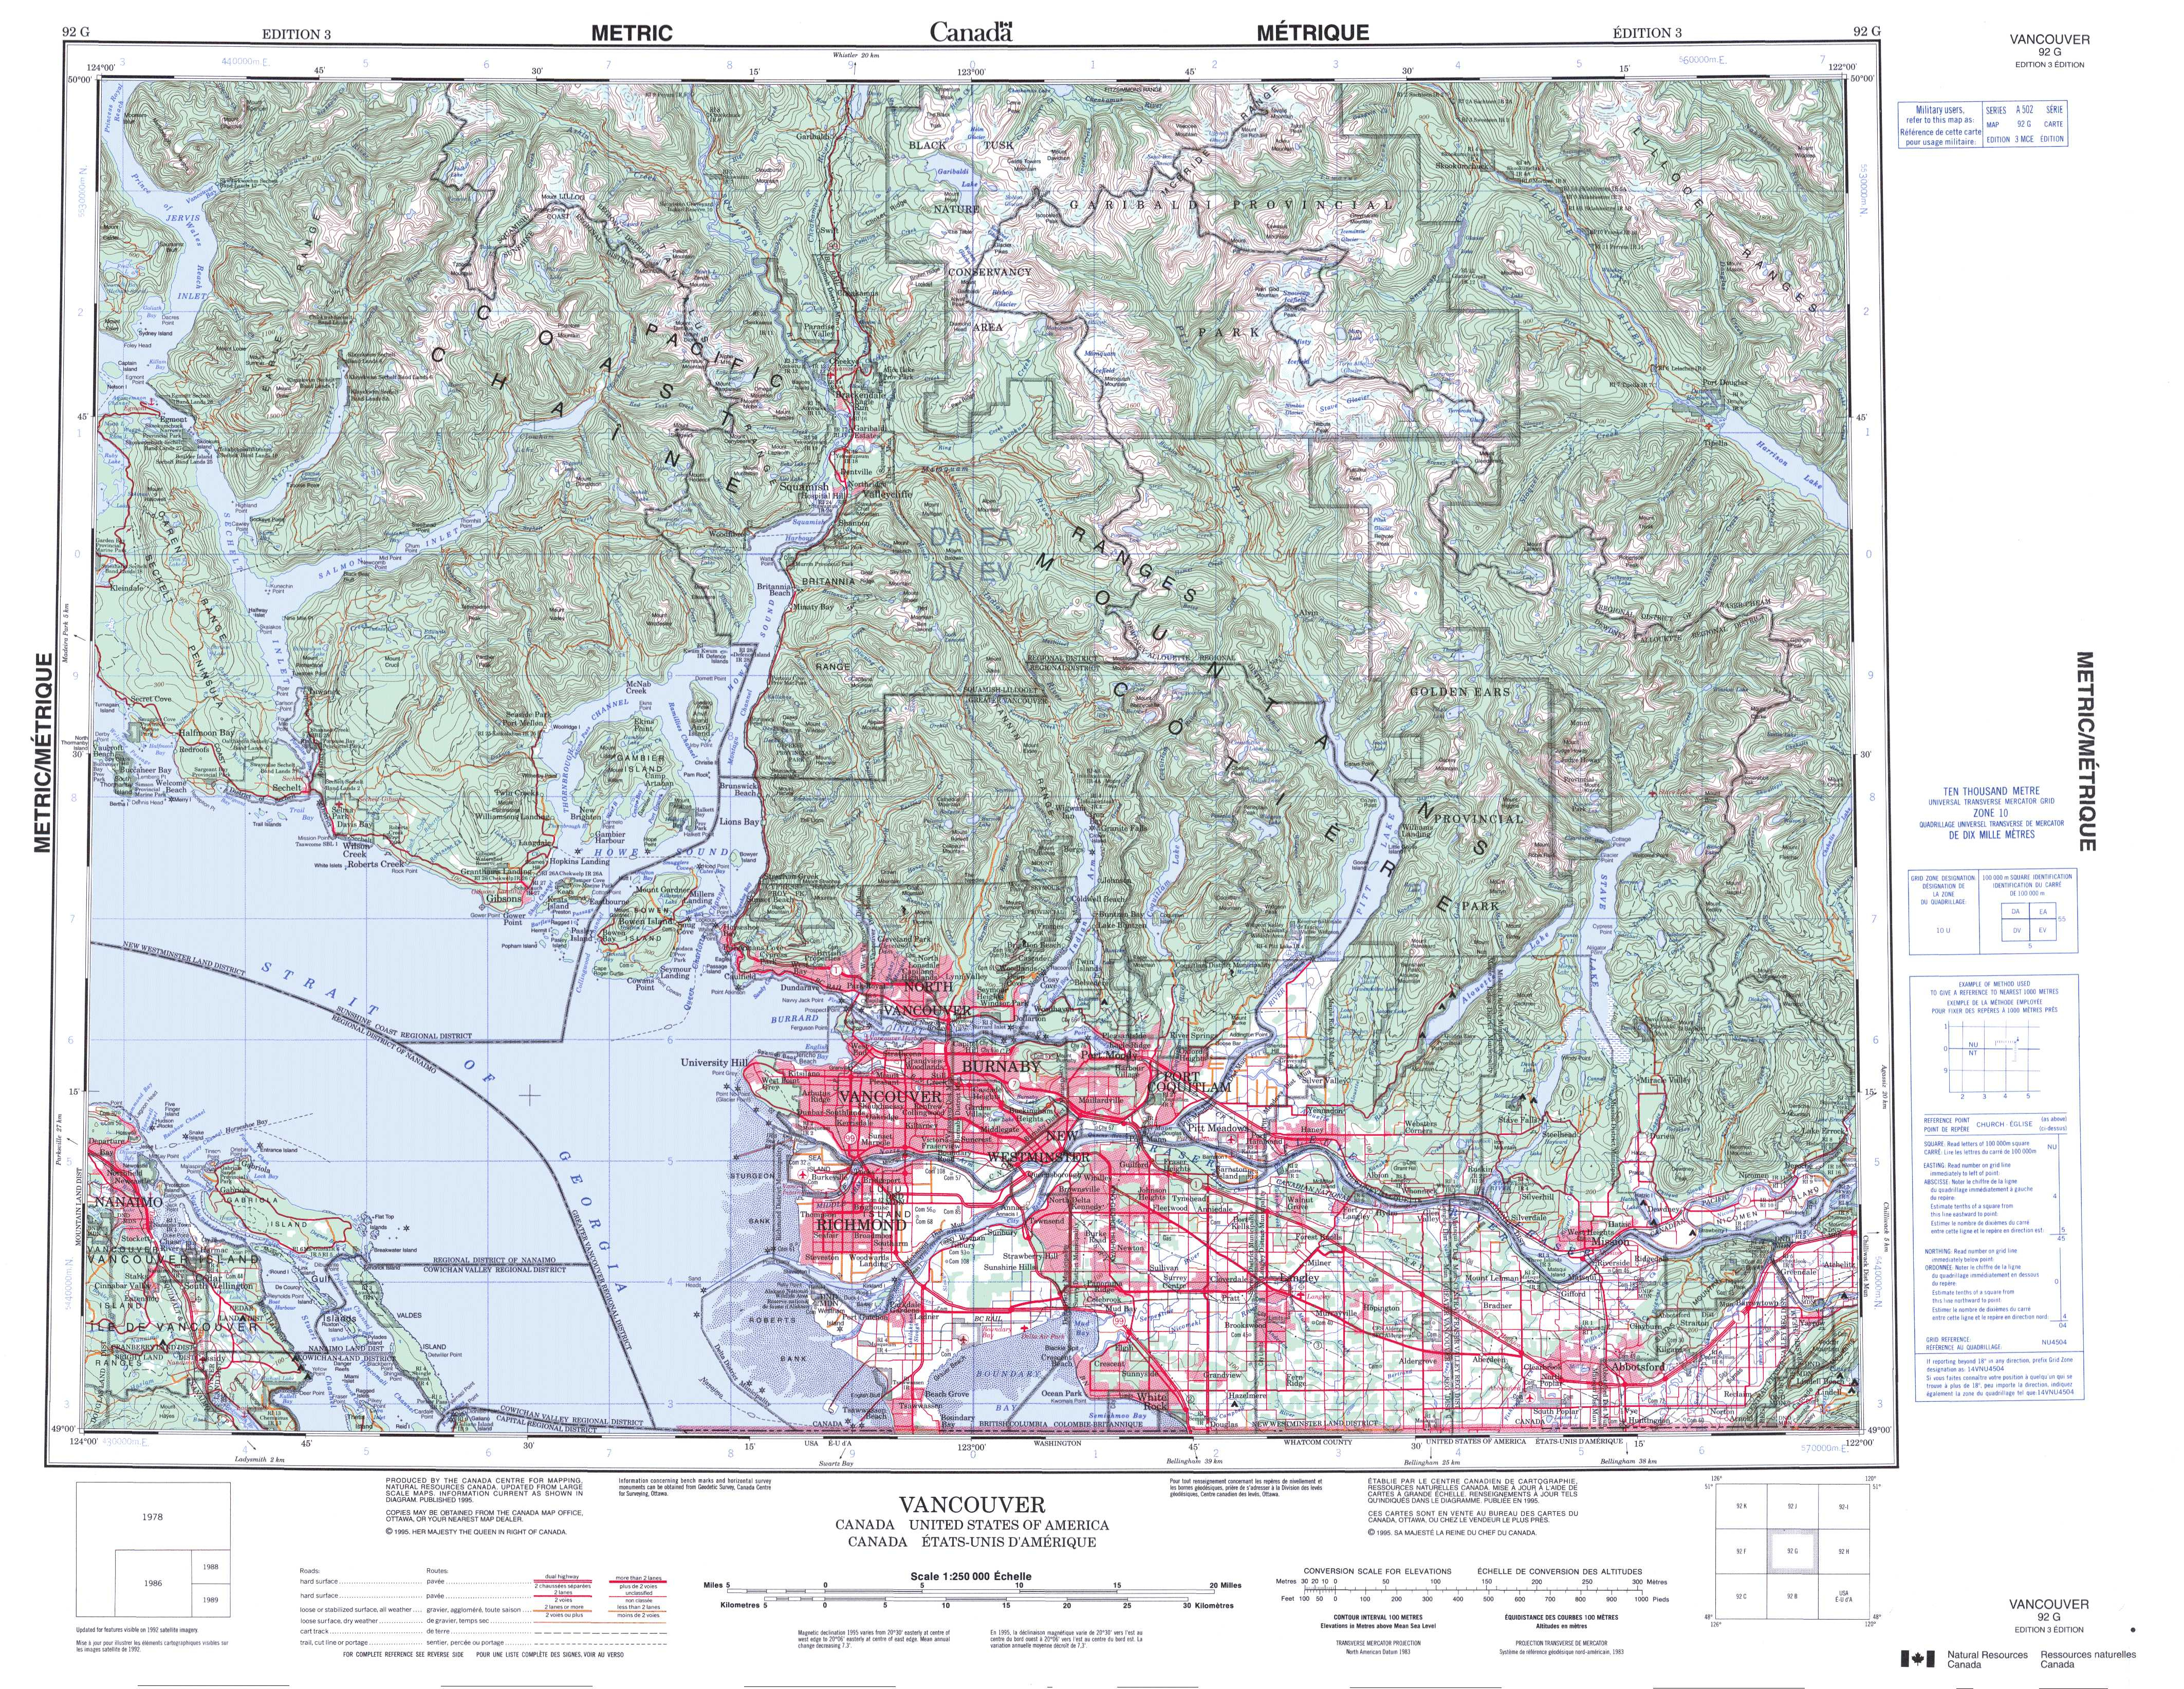 Printable Topographic Map Of Vancouver 092G, Bc - Free Printable Topo Maps